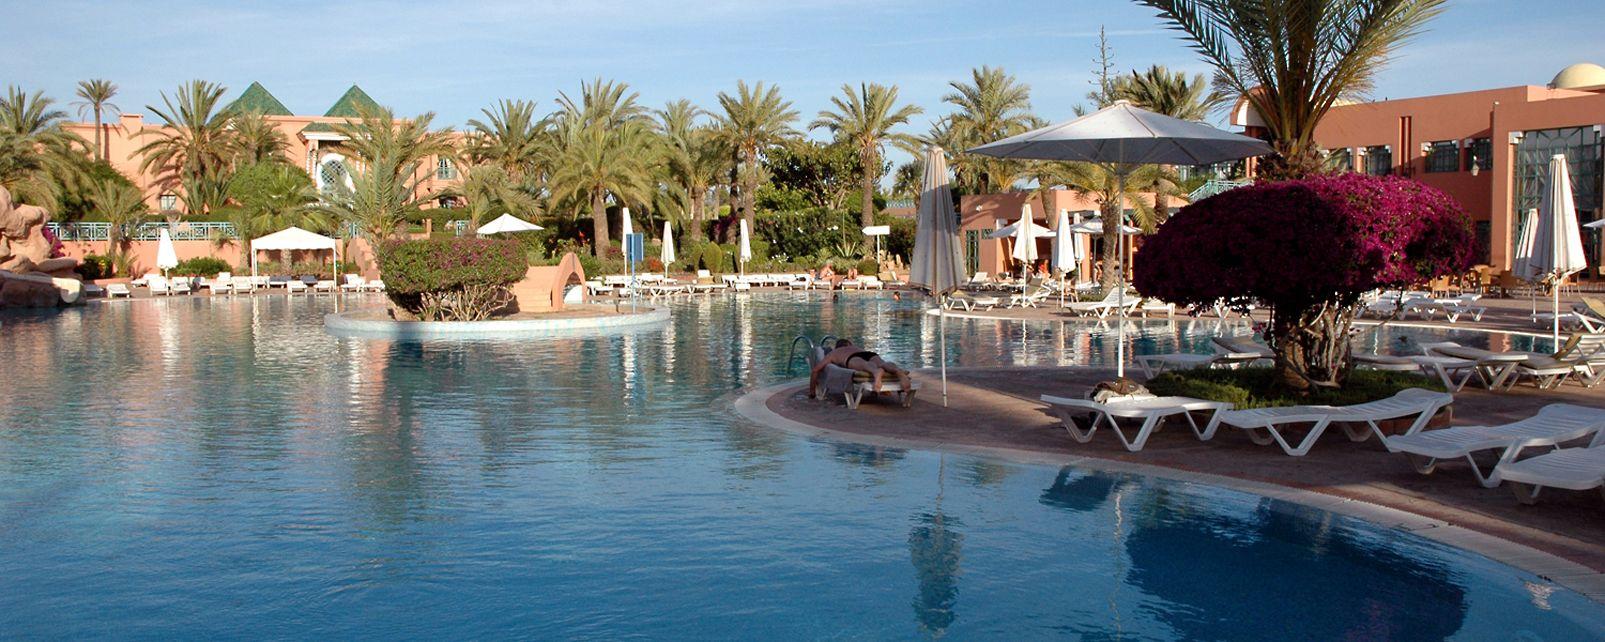 Hotel sangho marrakech in for Hotels marrakech